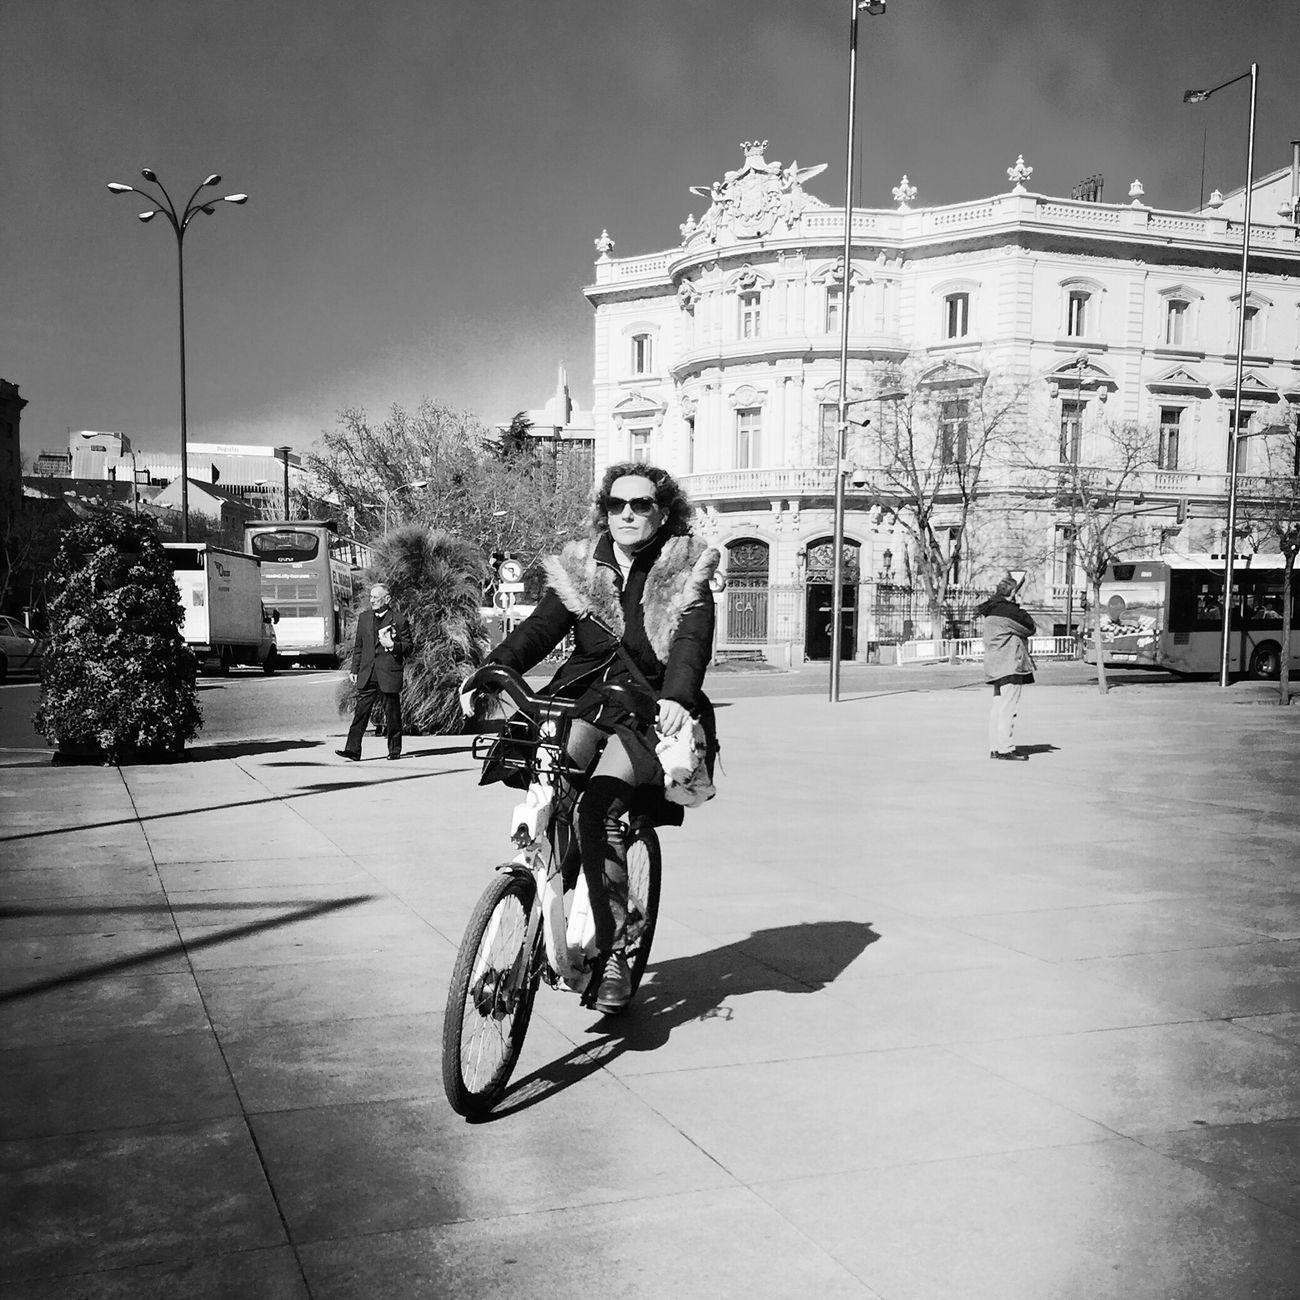 Streetphotography Monochrome_life Bw #bnw #BWcollaboration #istanbul #blackwhite #blackandwhite Movilgrafias